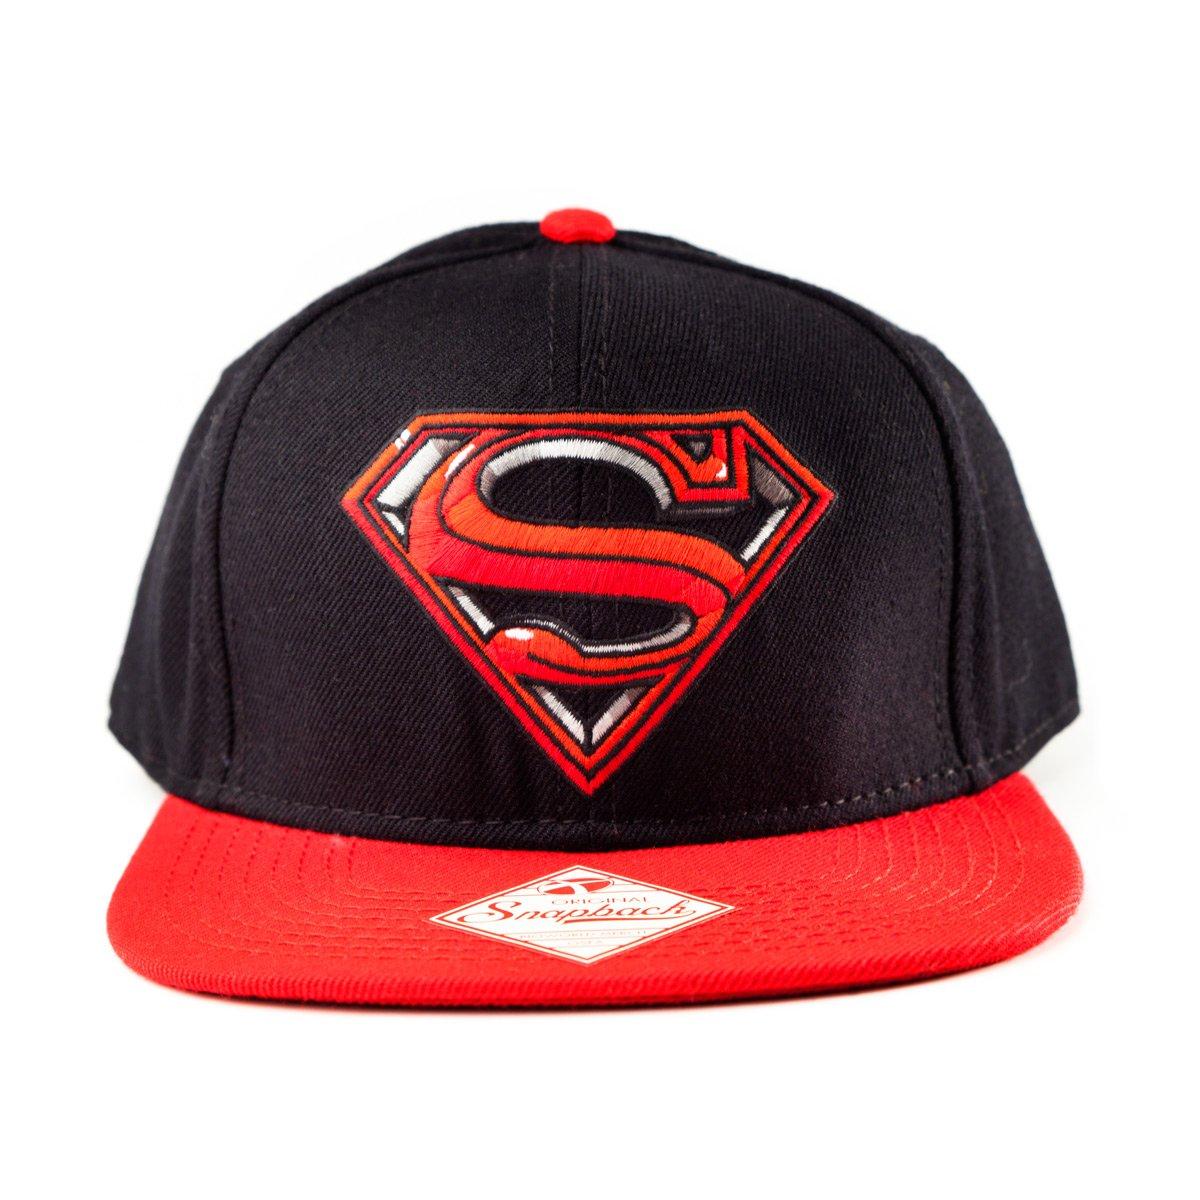 Superman Cap Original Snapback Black - Gorra de béisbol  Amazon.es   Deportes y aire libre 5af92fa7043